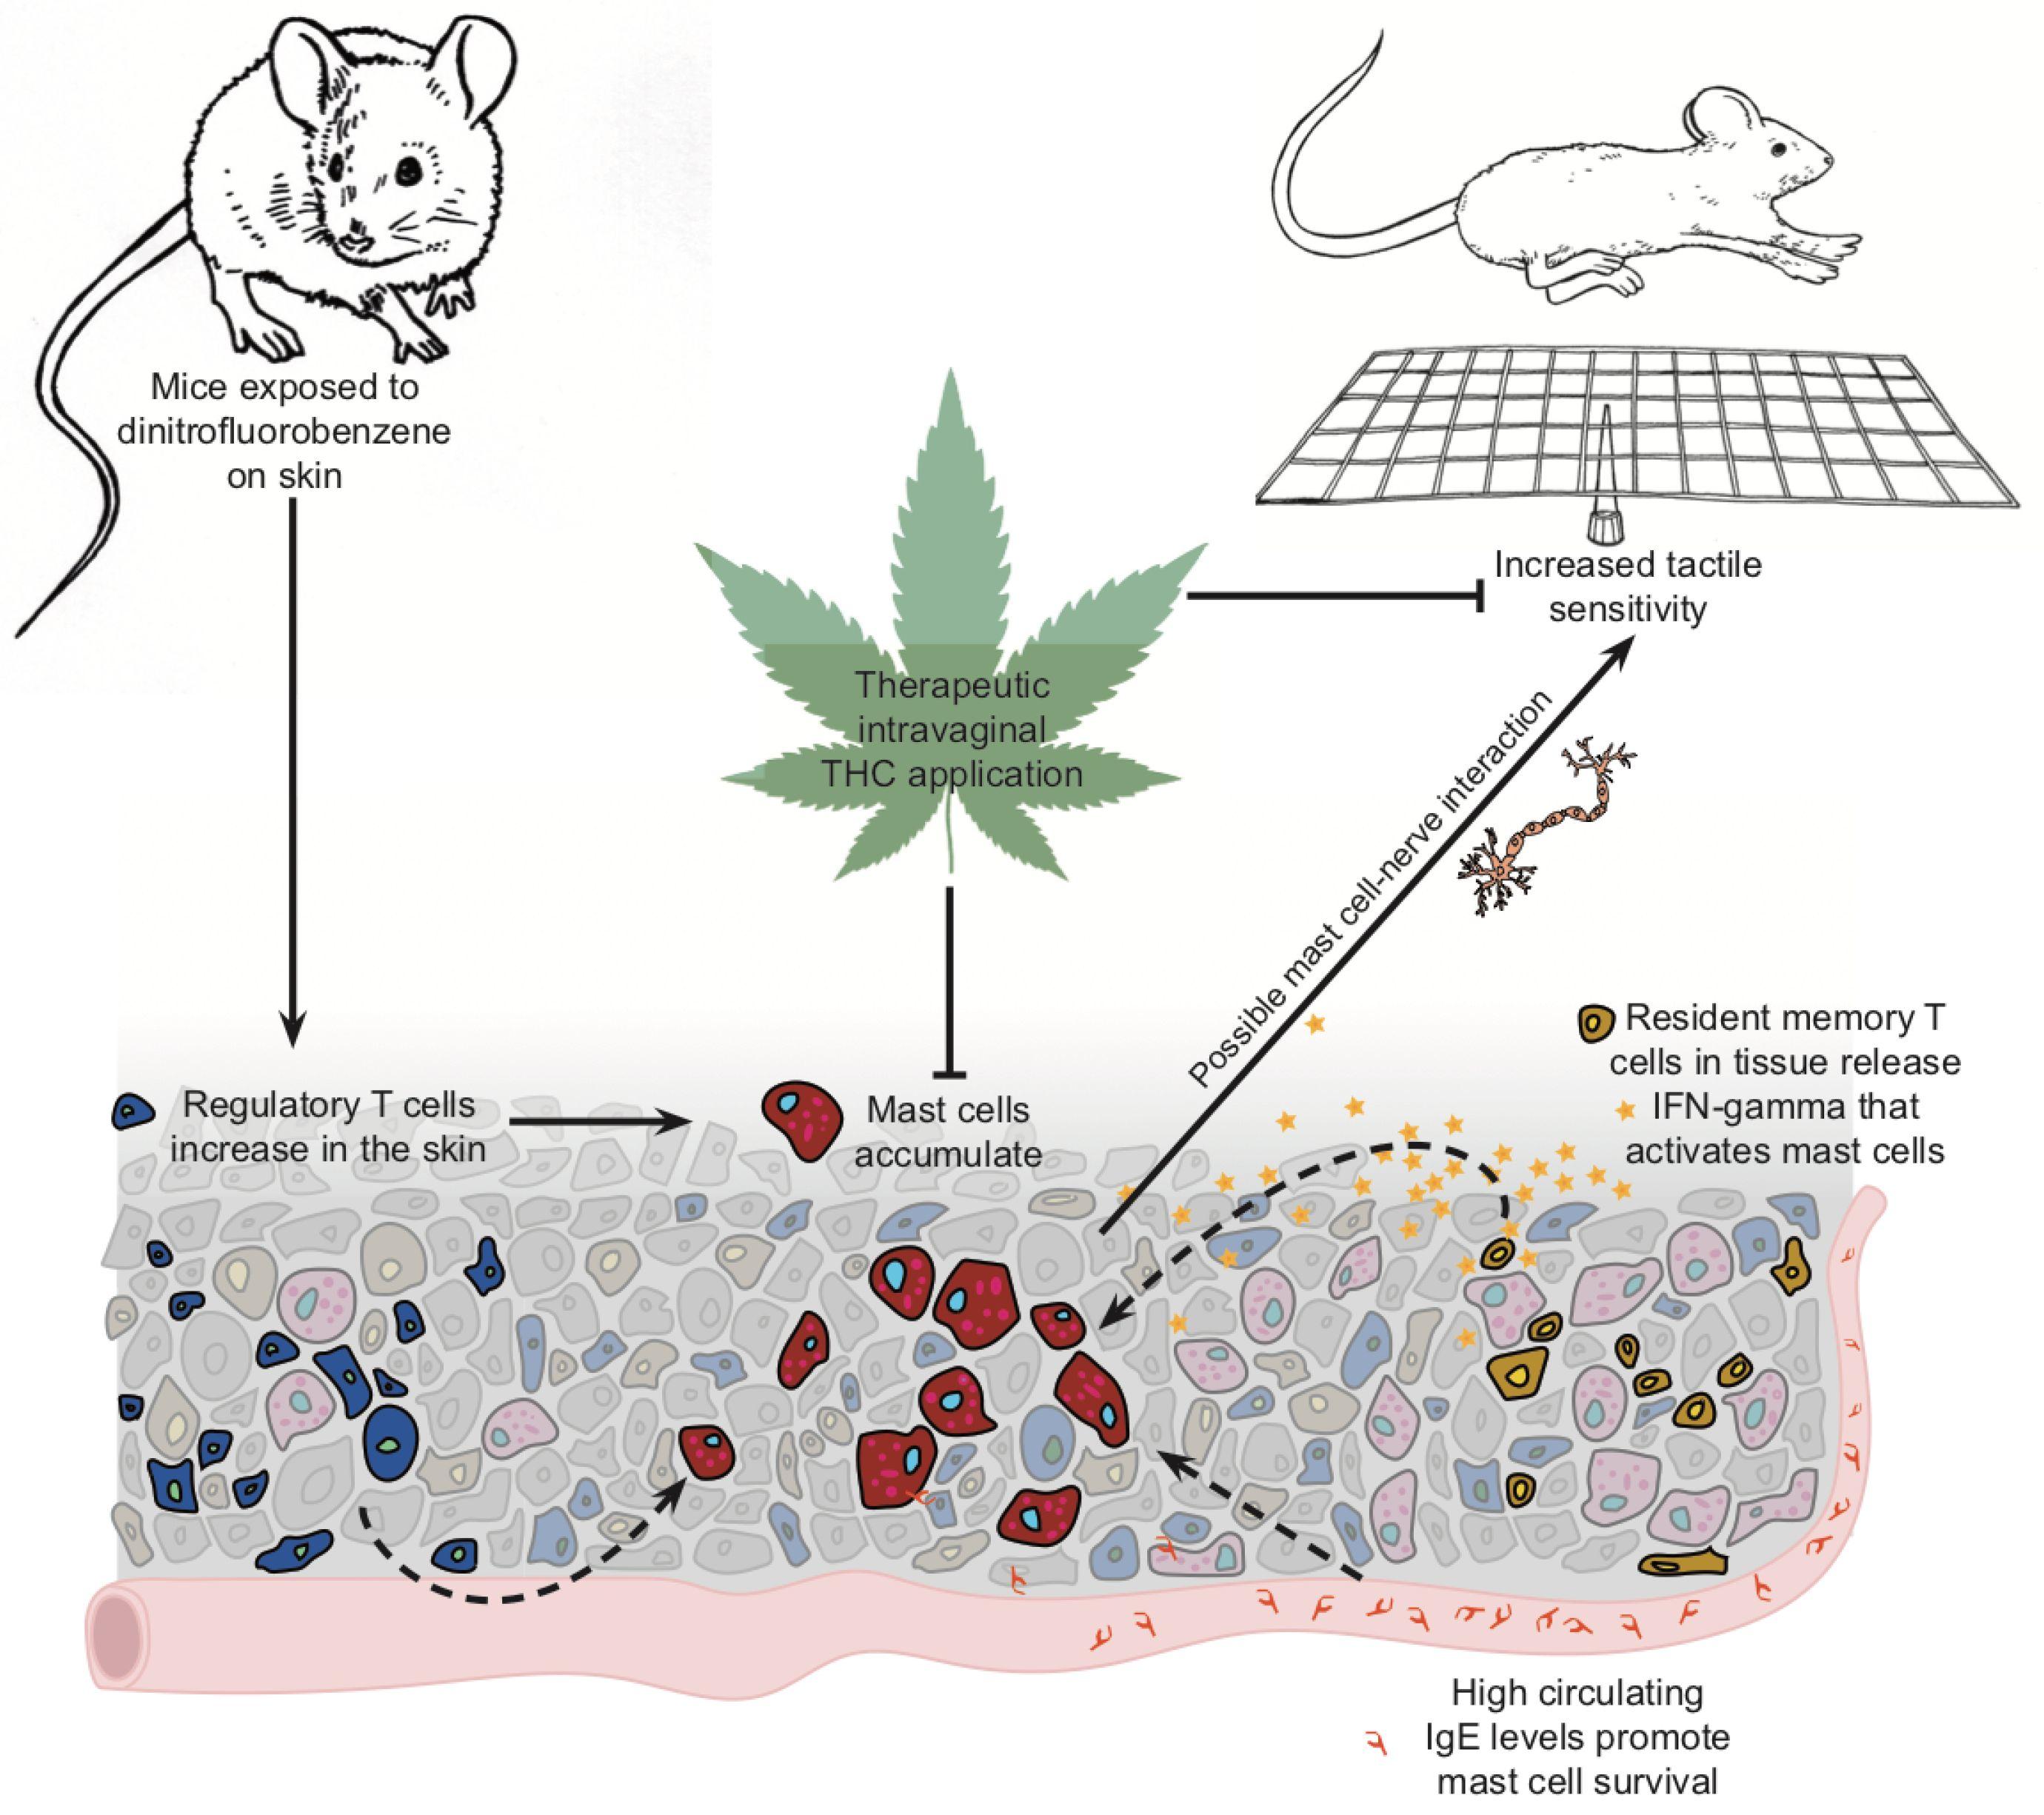 IJMS | Free Full-Text | Tetrahydrocannabinol Reduces Hapten